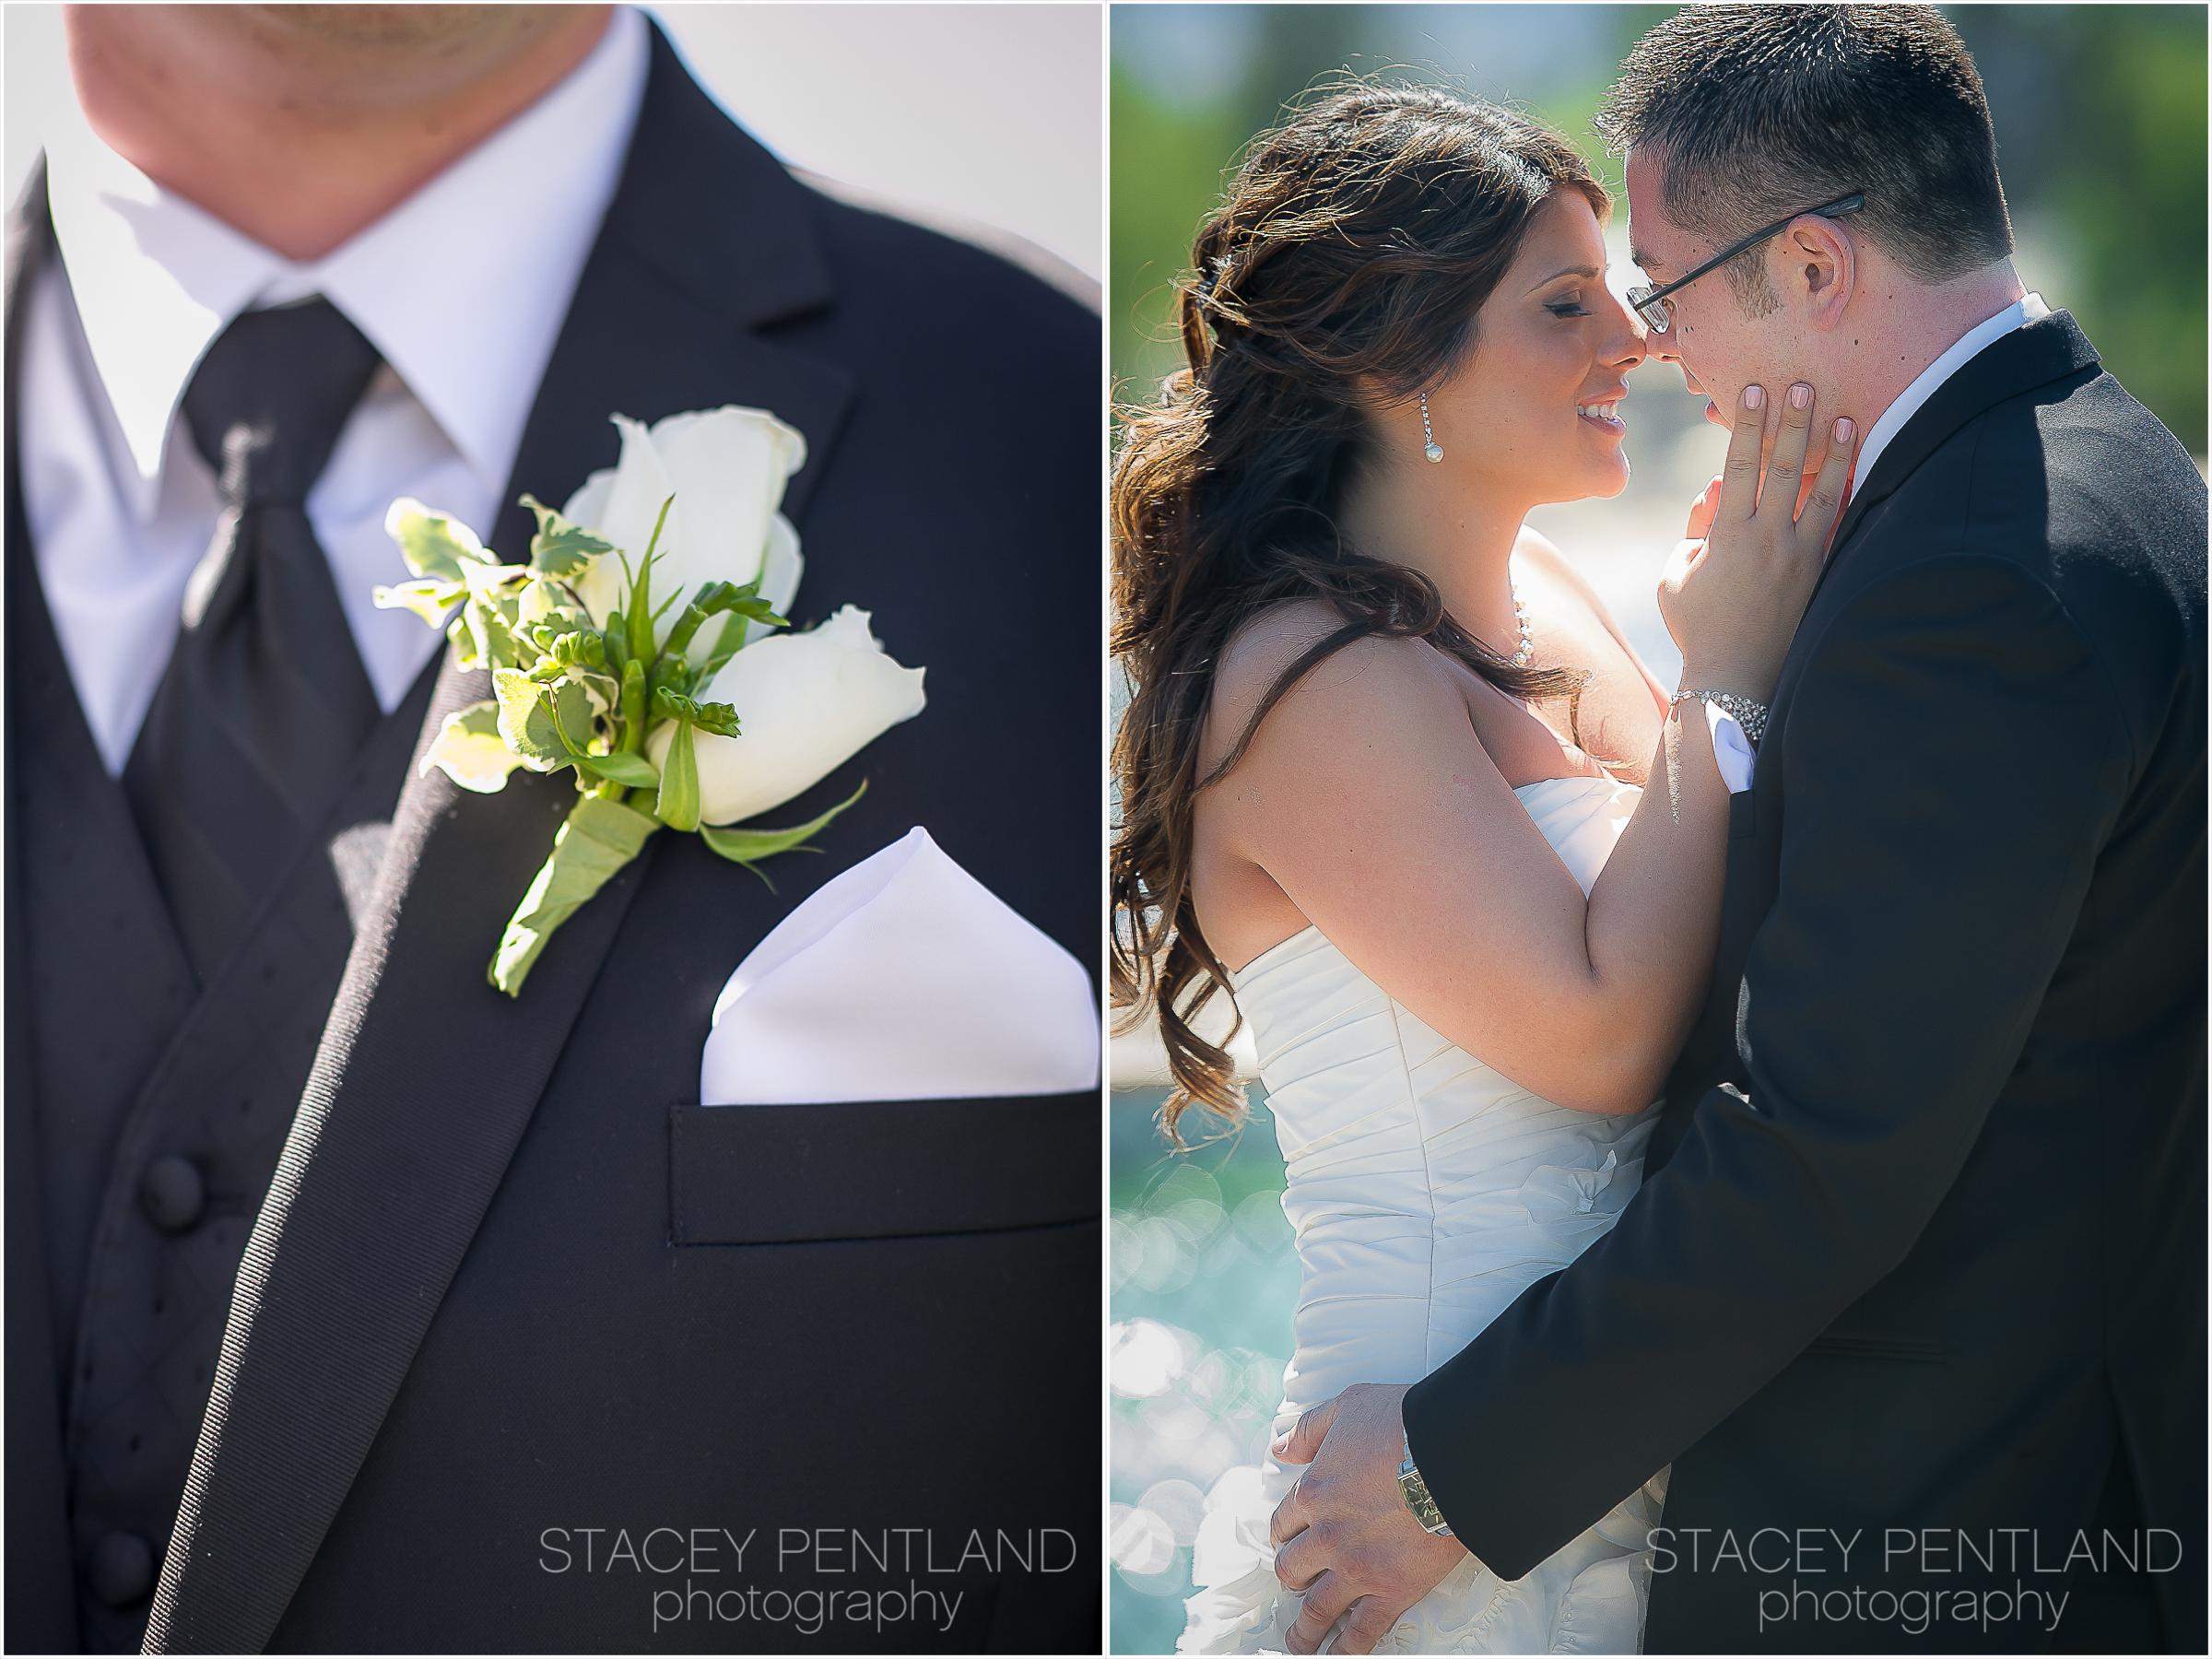 roxanne+michael_wedding-001.jpg